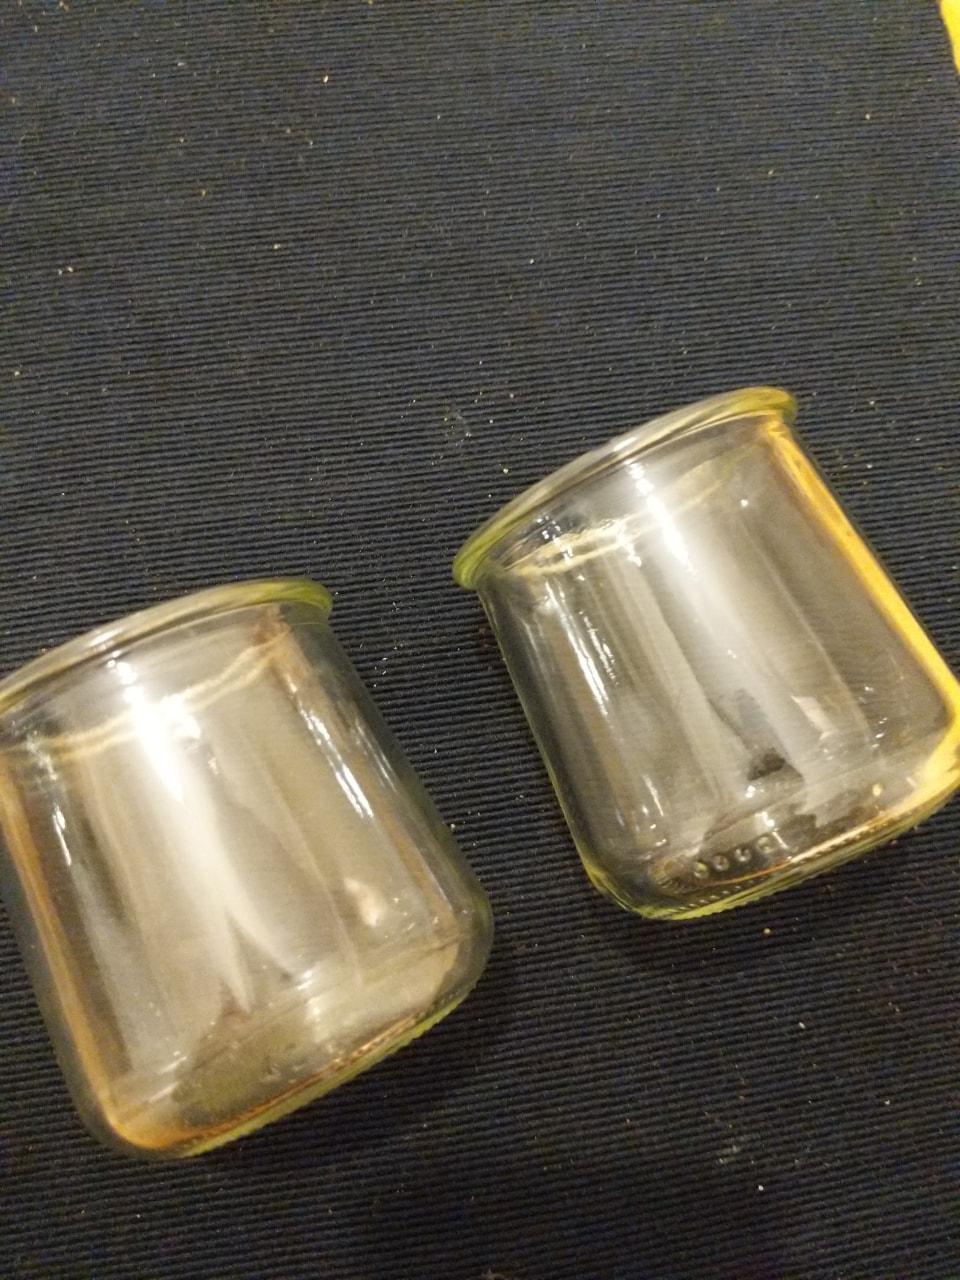 Two nice pots